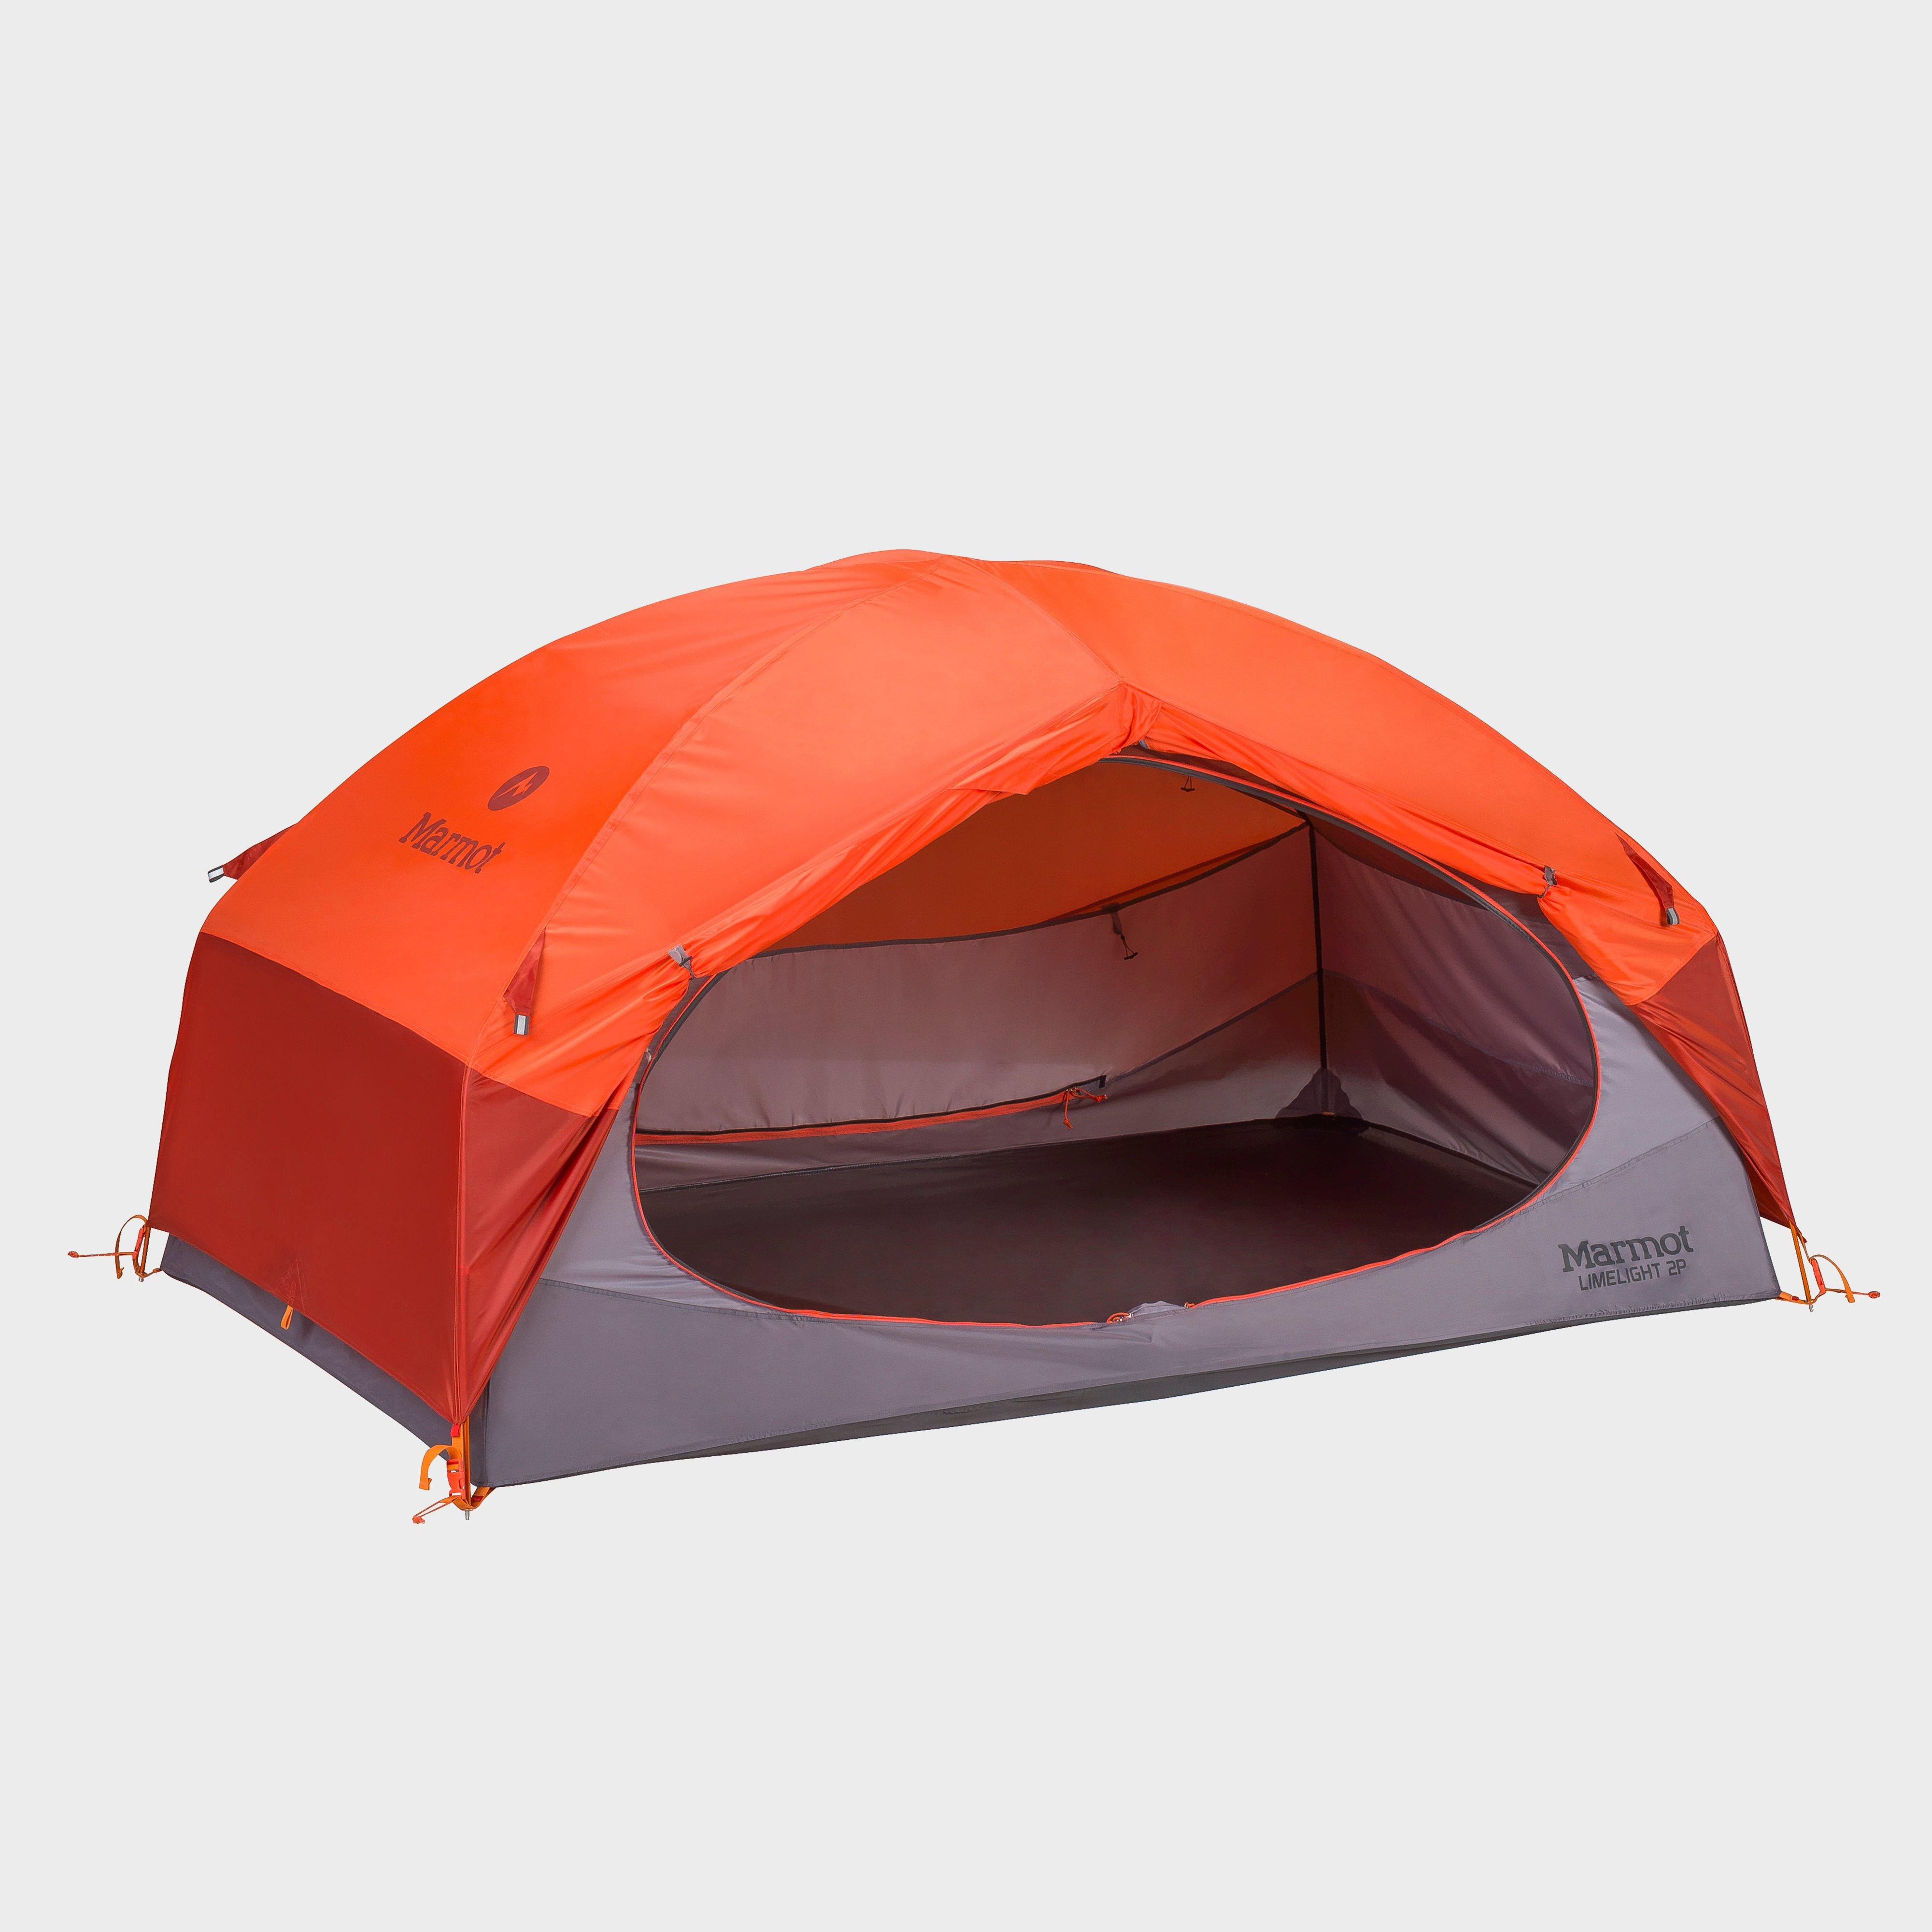 Marmot Limelight 2 Man Tent & Marmot Limelight 2 Man Tent | Millet Sports